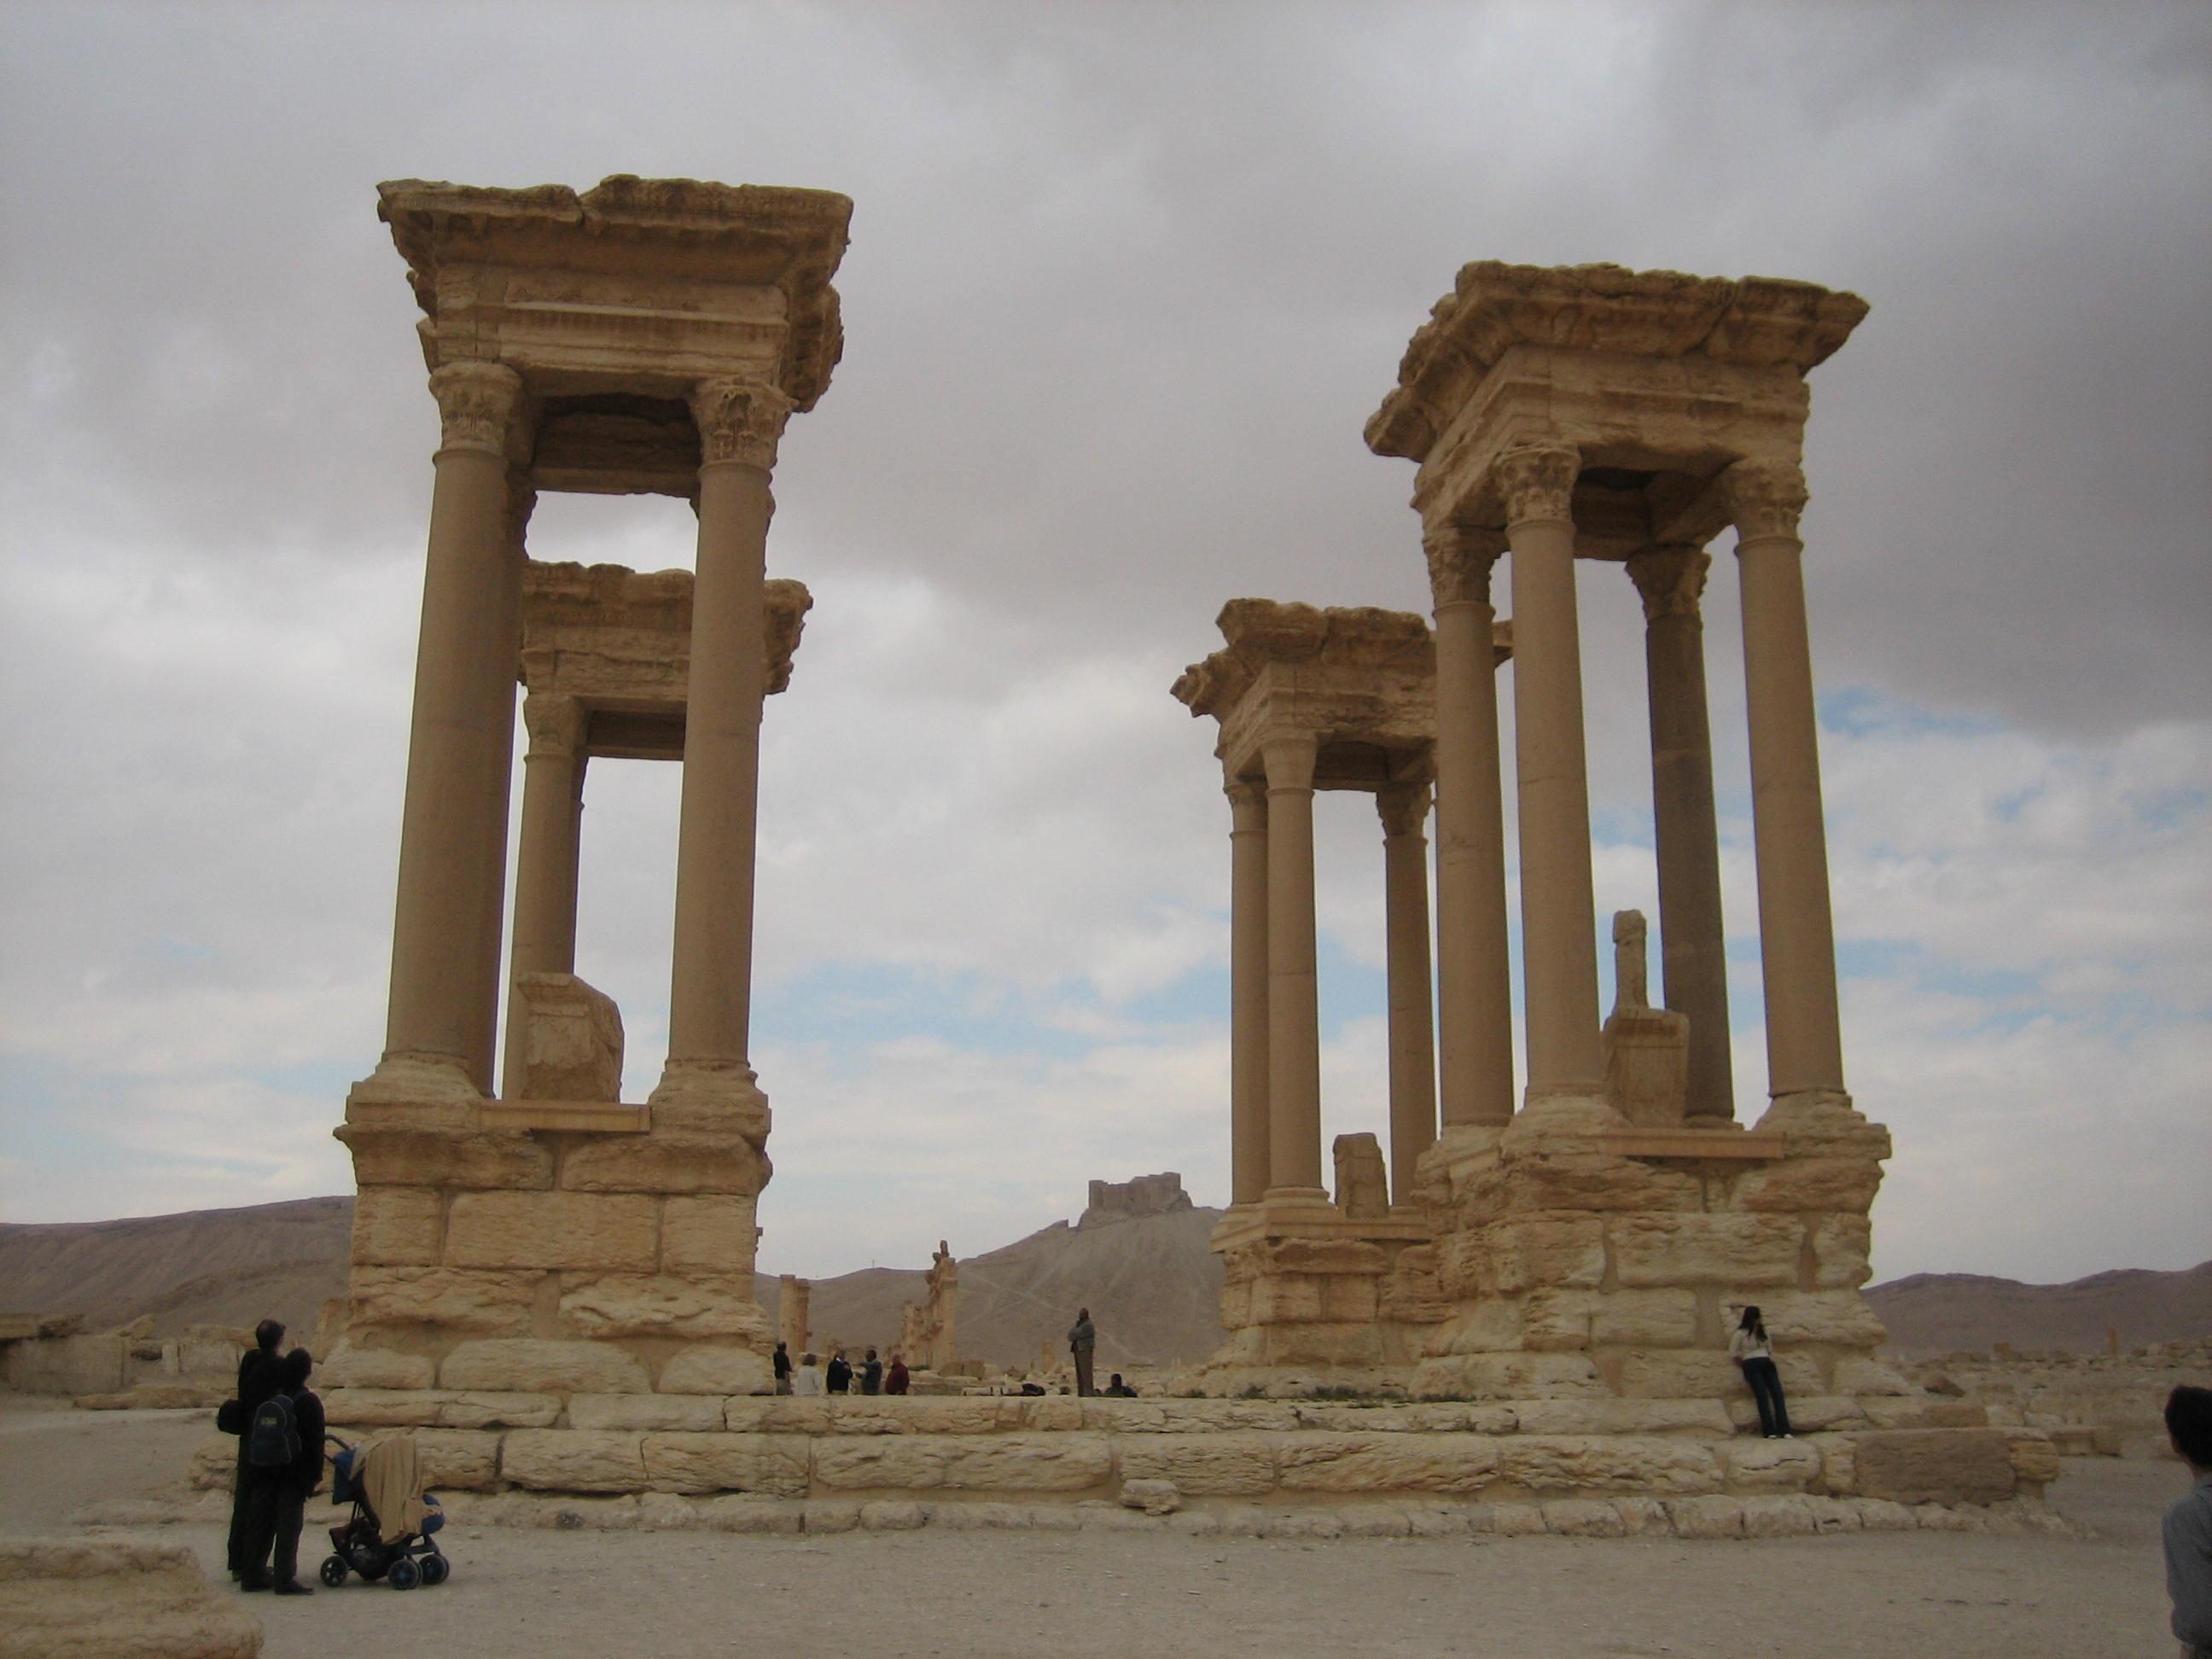 Figure 3: Palmyra, tetrapylon (photo by Tate Paulette, 2005)